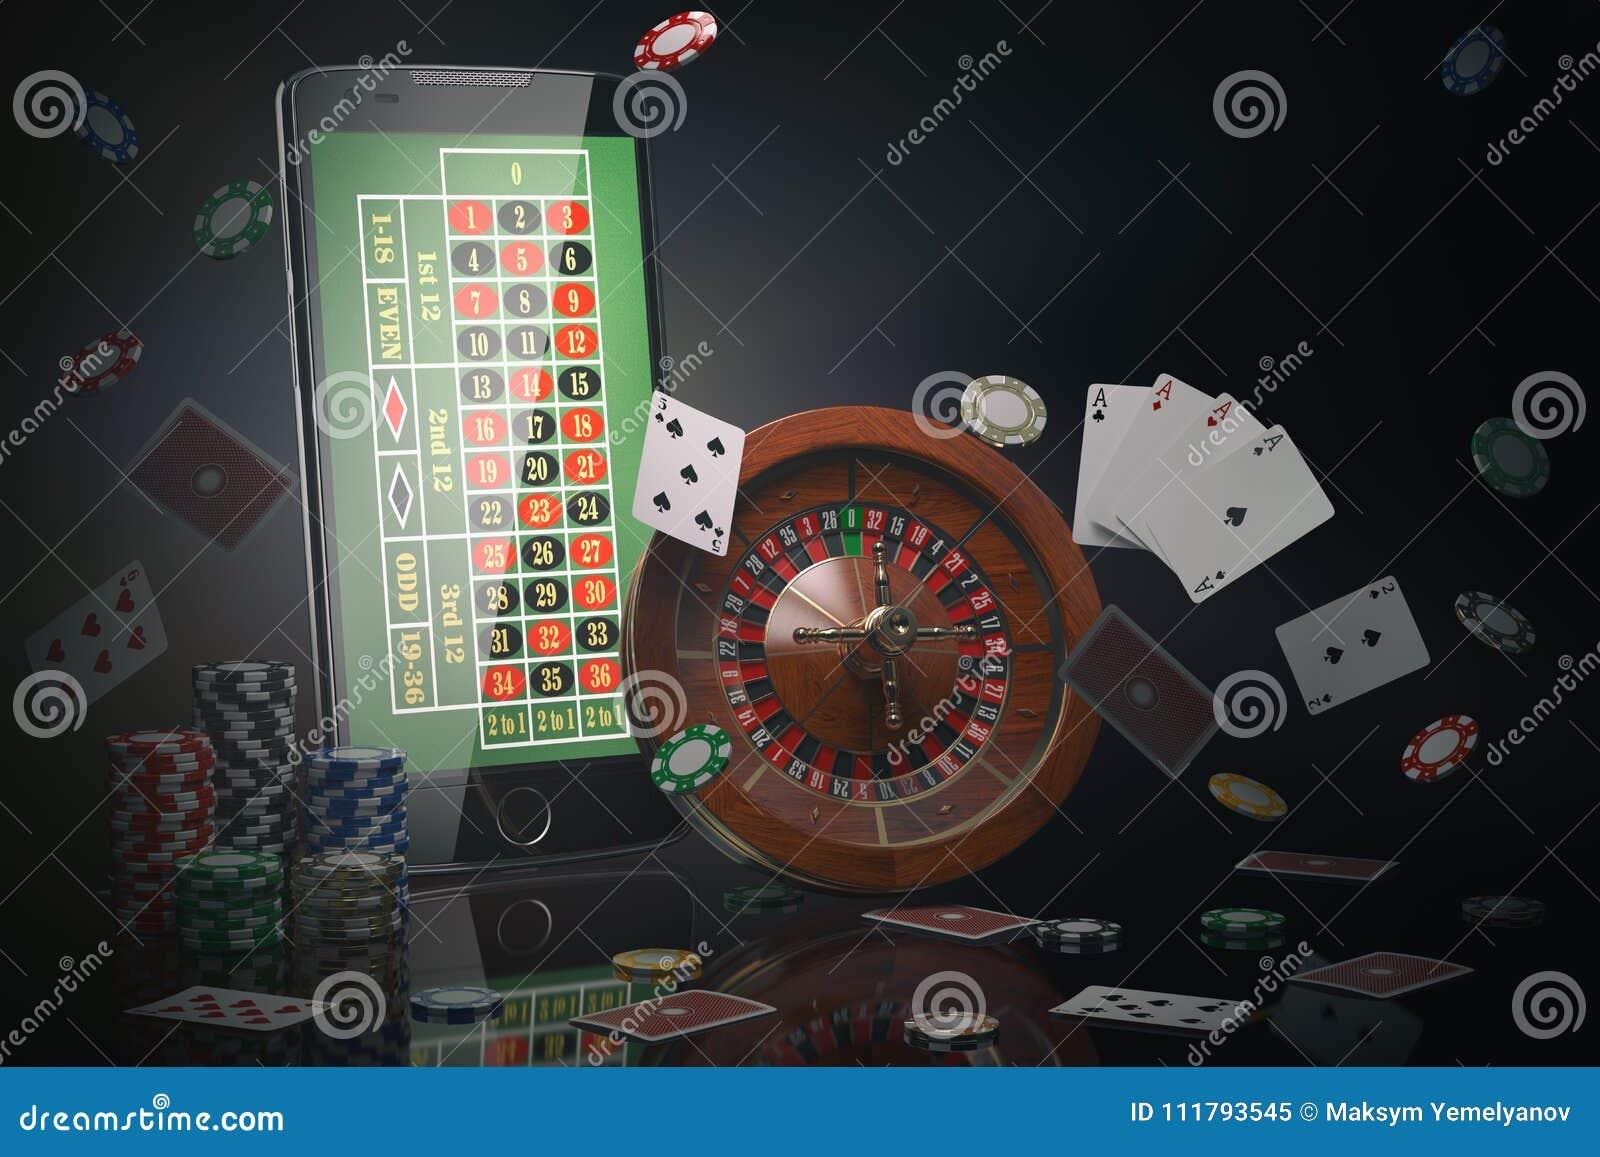 casinos in california with slot machines